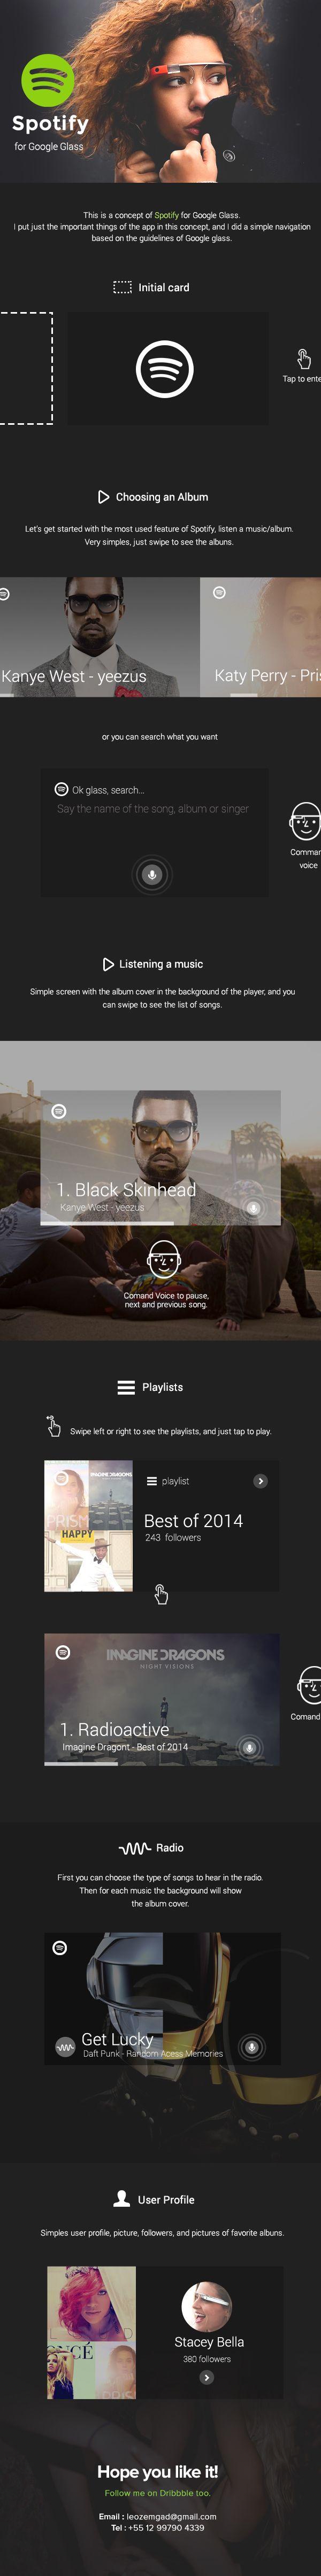 Spotify for Google Glass by Leonardo Zem, via Behance